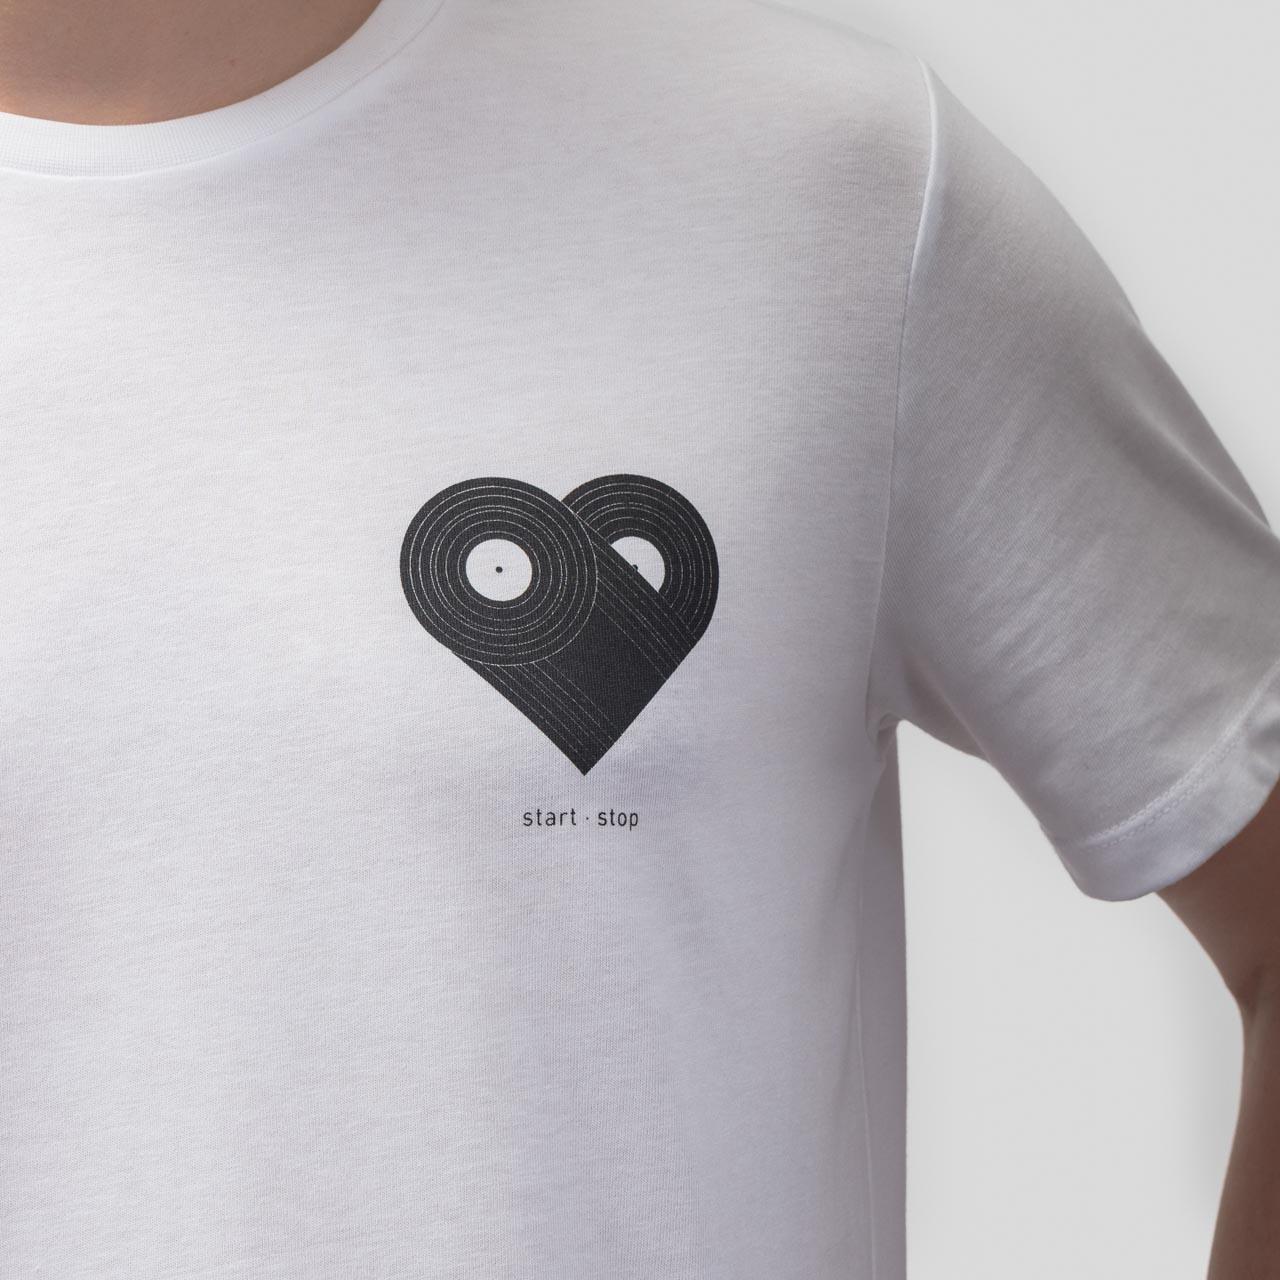 7bda8a62a53a Technics Black Heart T-Shirt - White